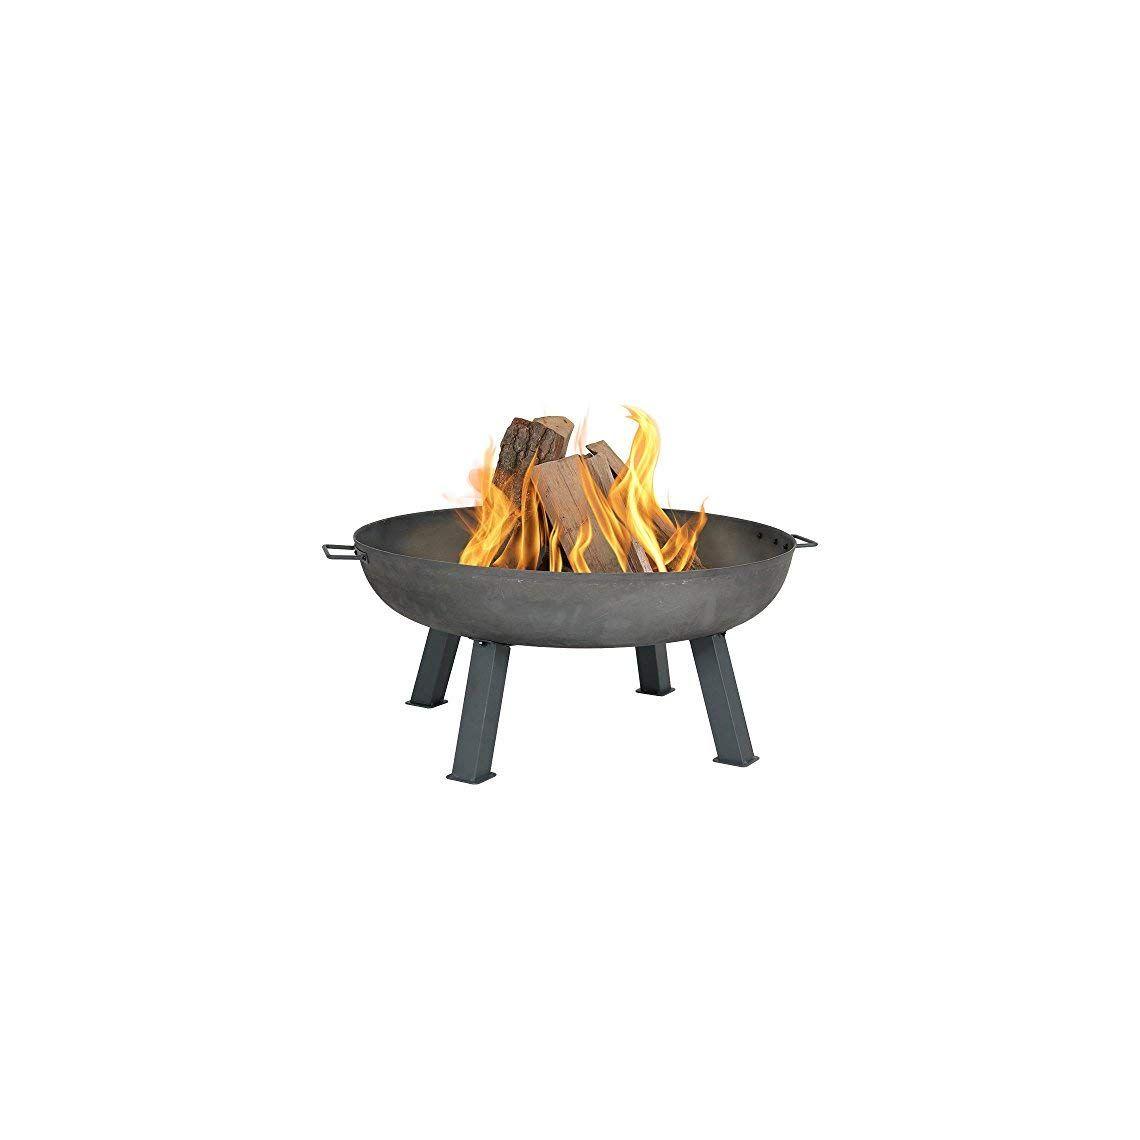 Sunnydaze Cast Iron Outdoor Fire Pit Bowl 34 Inch Large Round